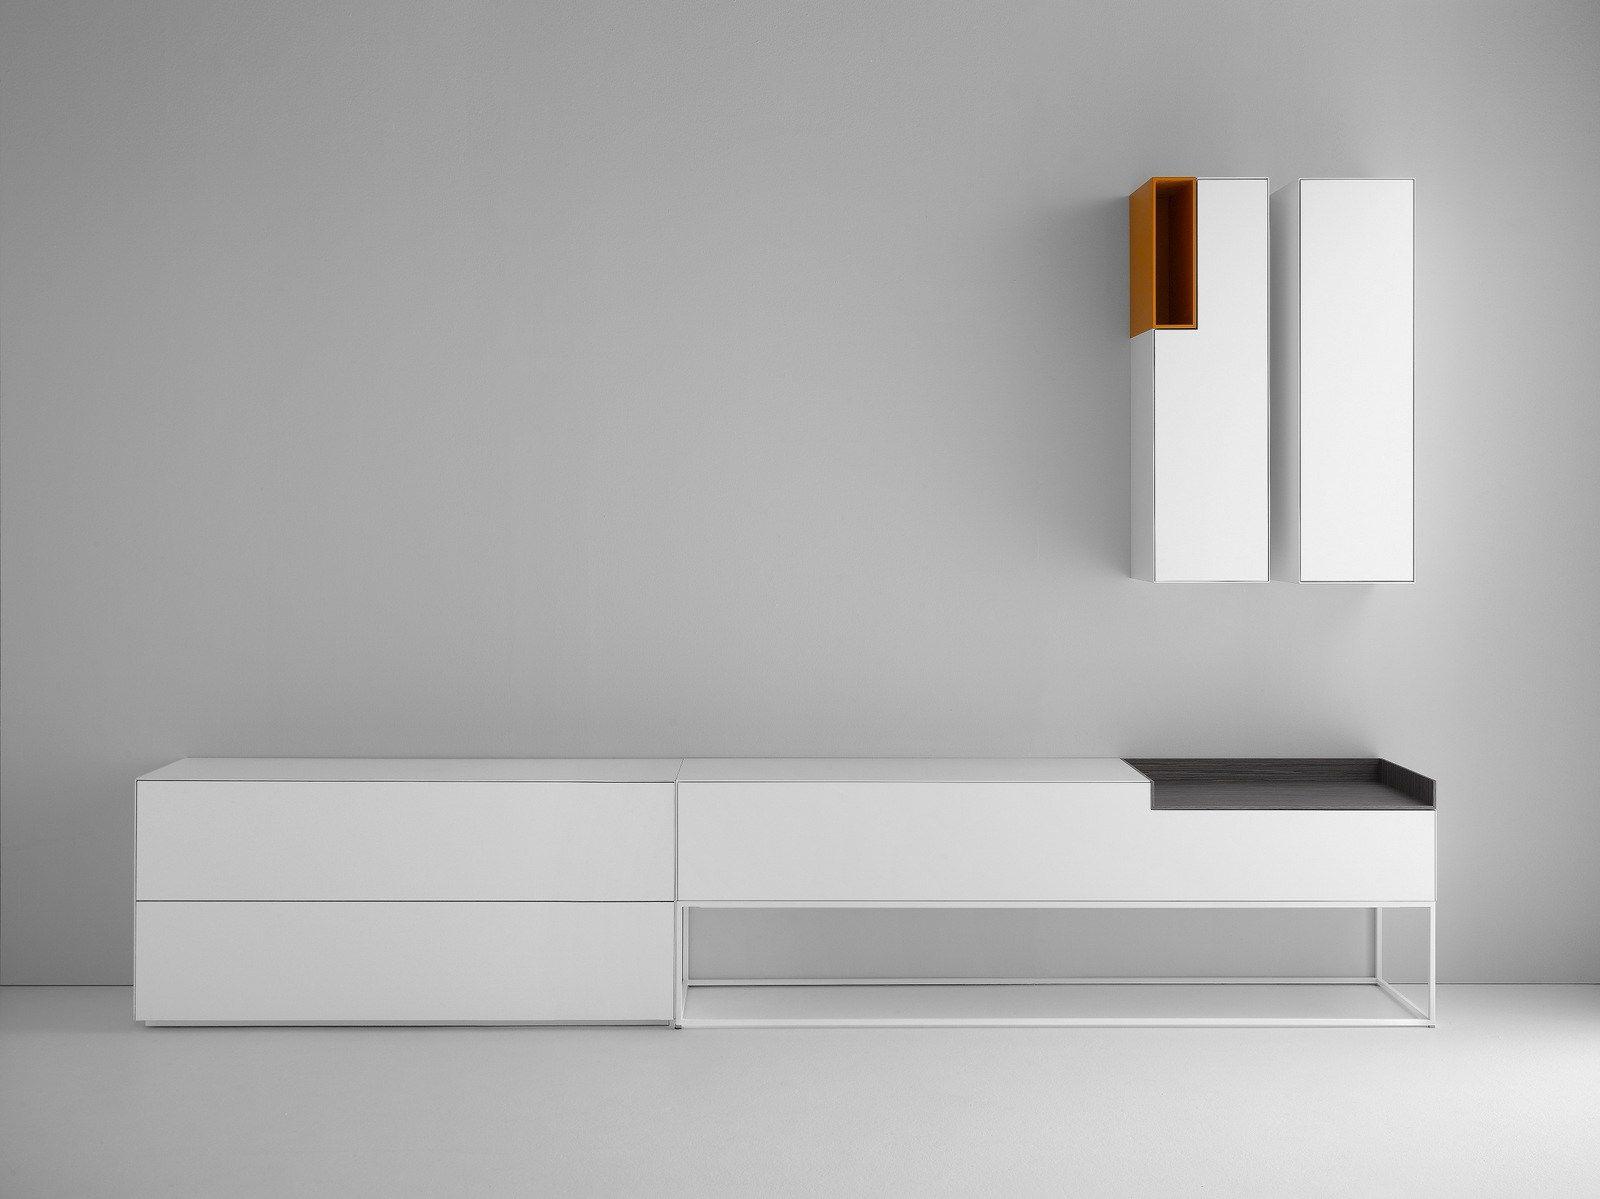 inmotion madia con cassetti by mdf italia design eva paster michael geldmacher. Black Bedroom Furniture Sets. Home Design Ideas